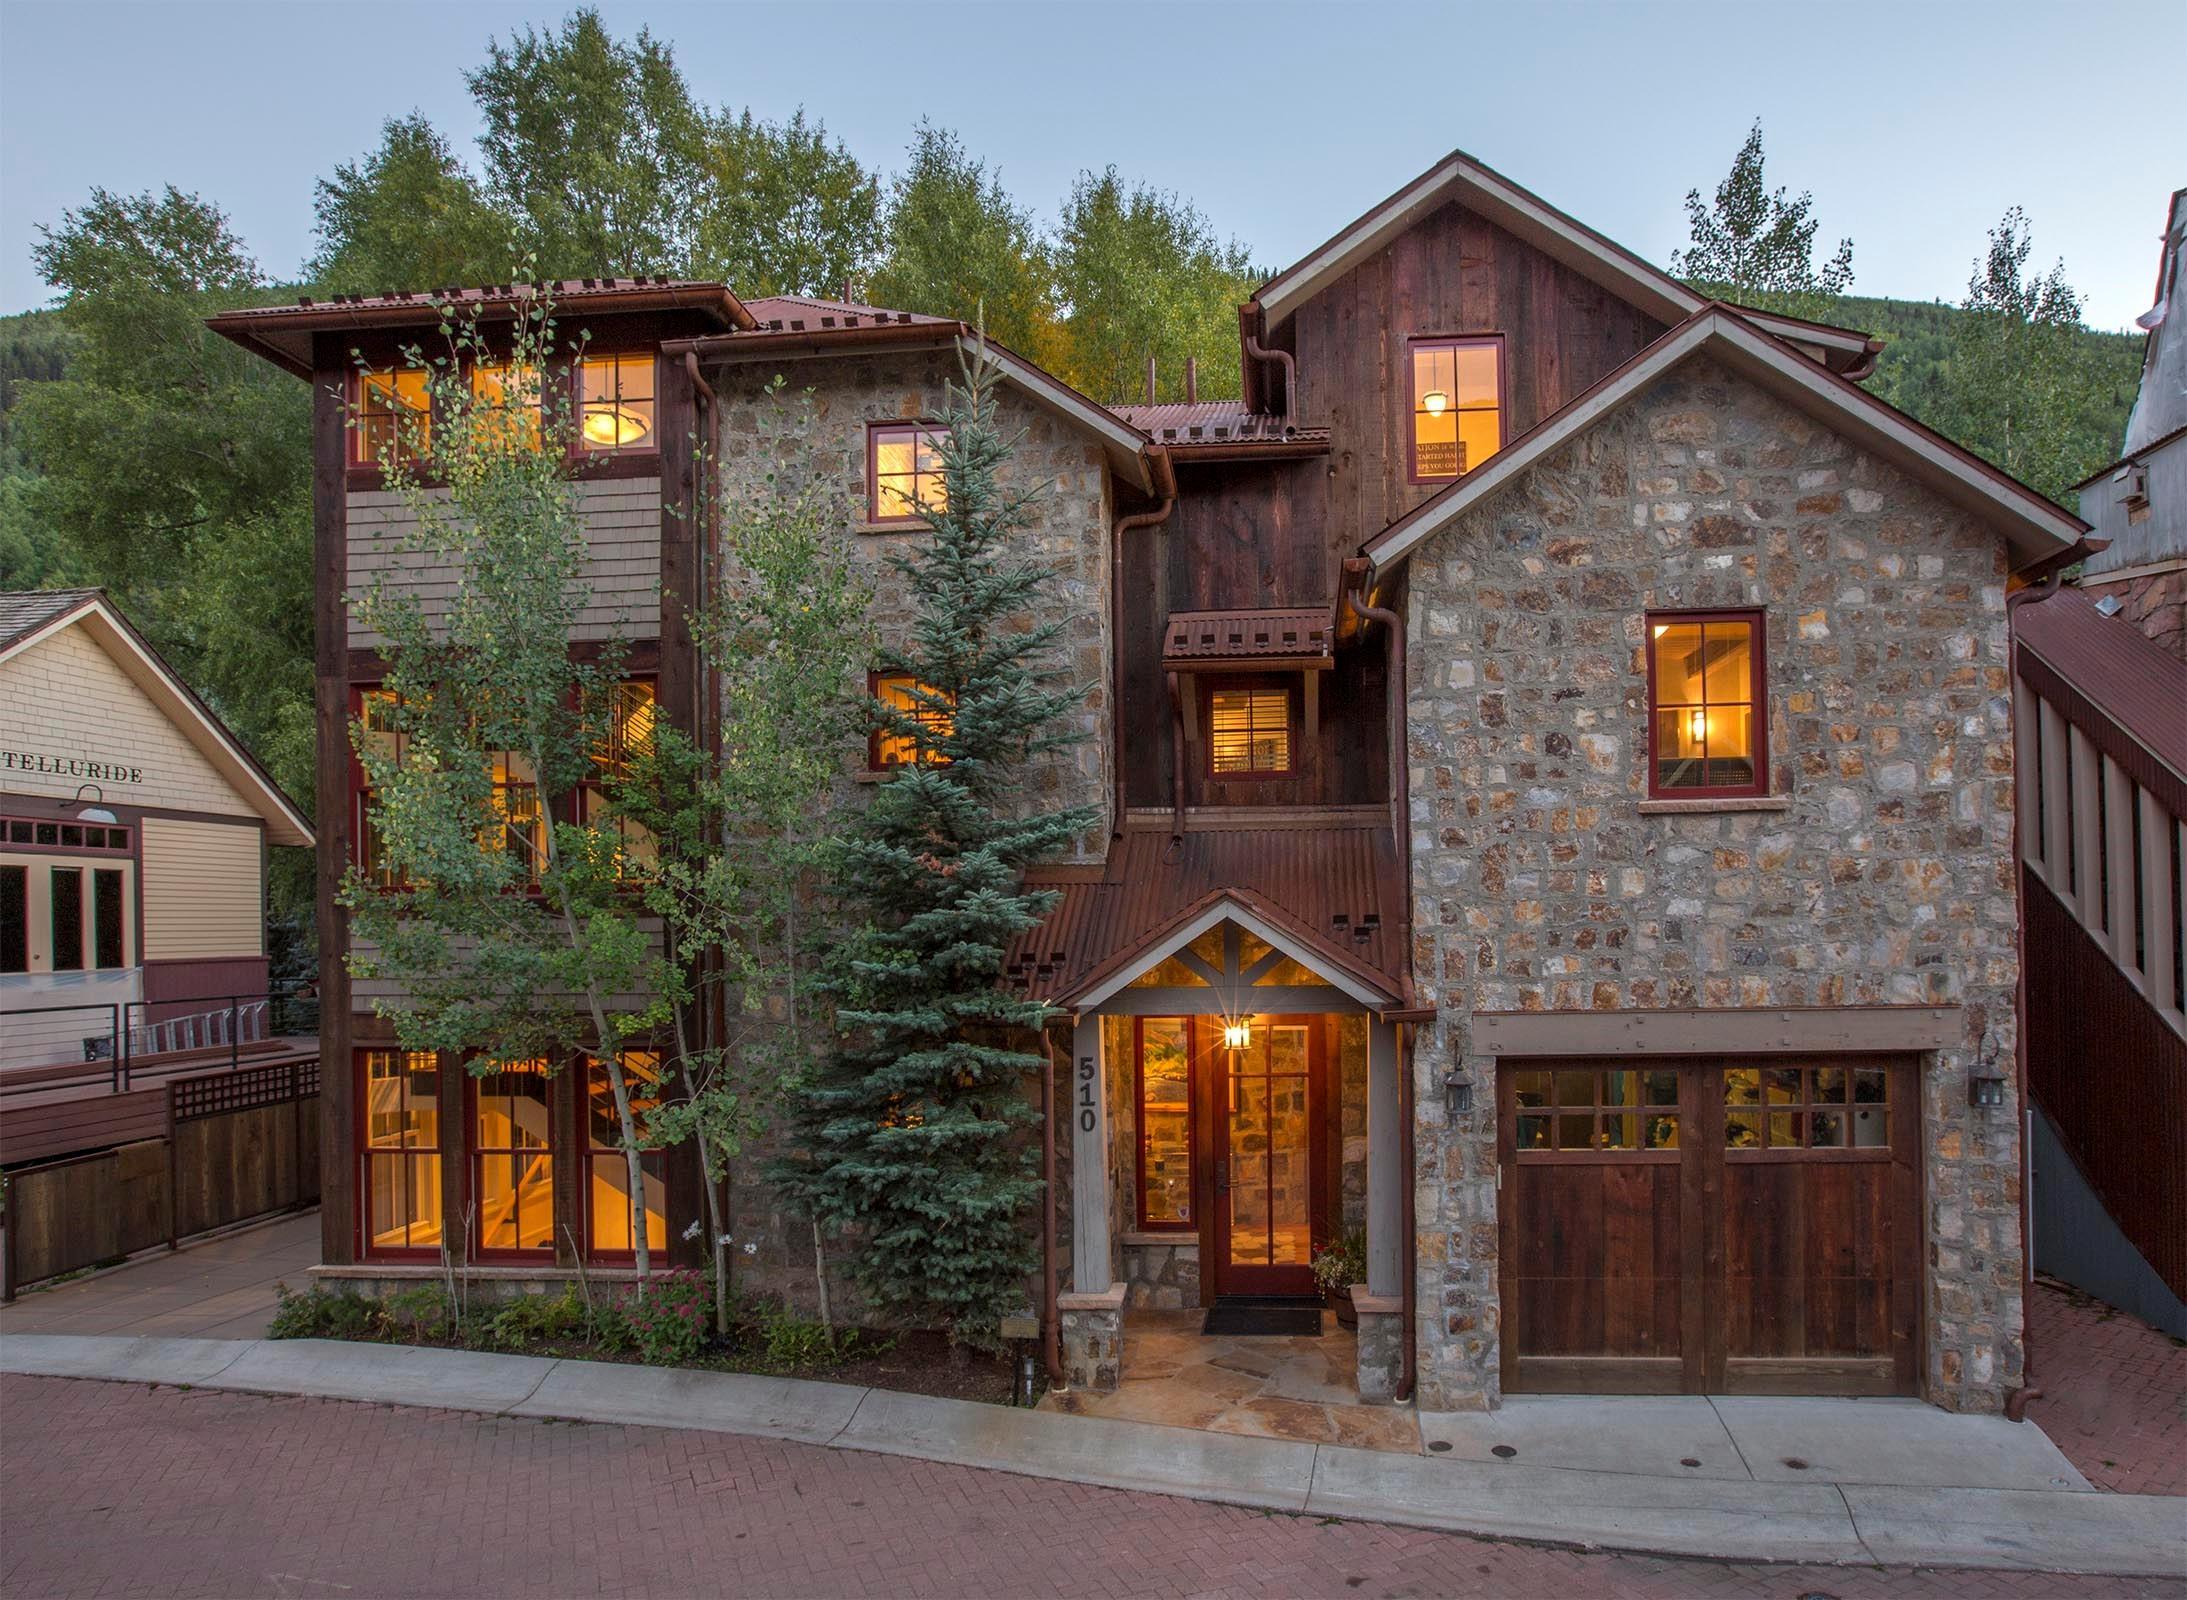 Telluride Mountain Retreat A Luxury Home For Sale In Telluride San